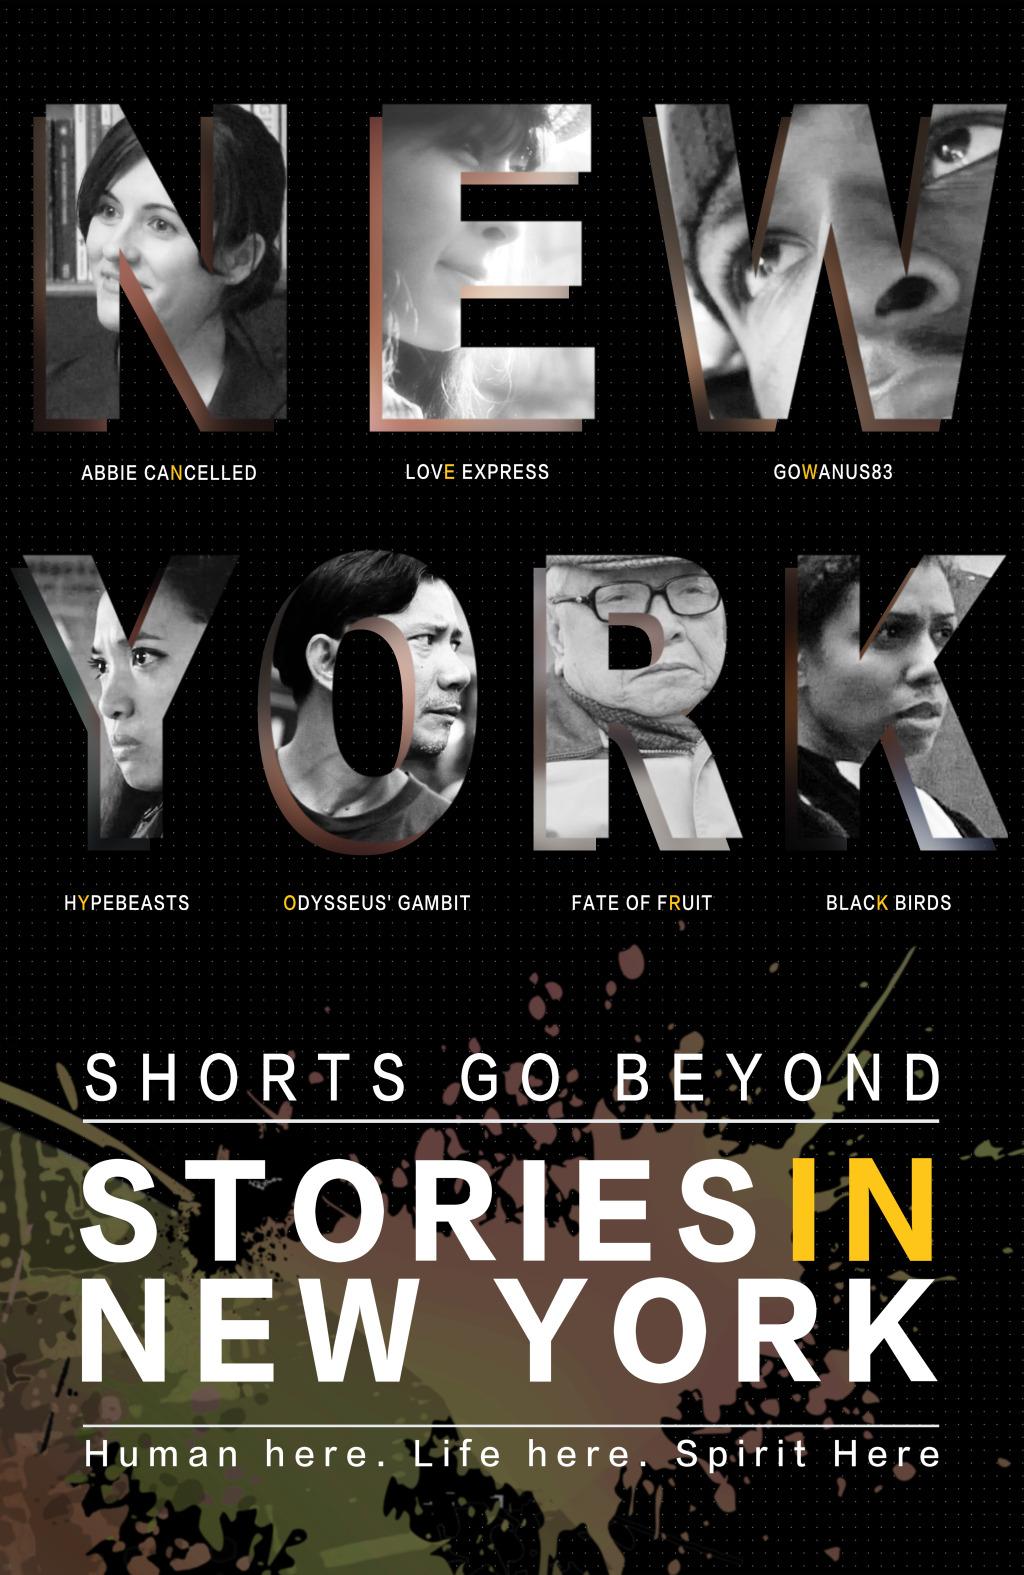 StoriesInNewYork_poster03(01.24.15)